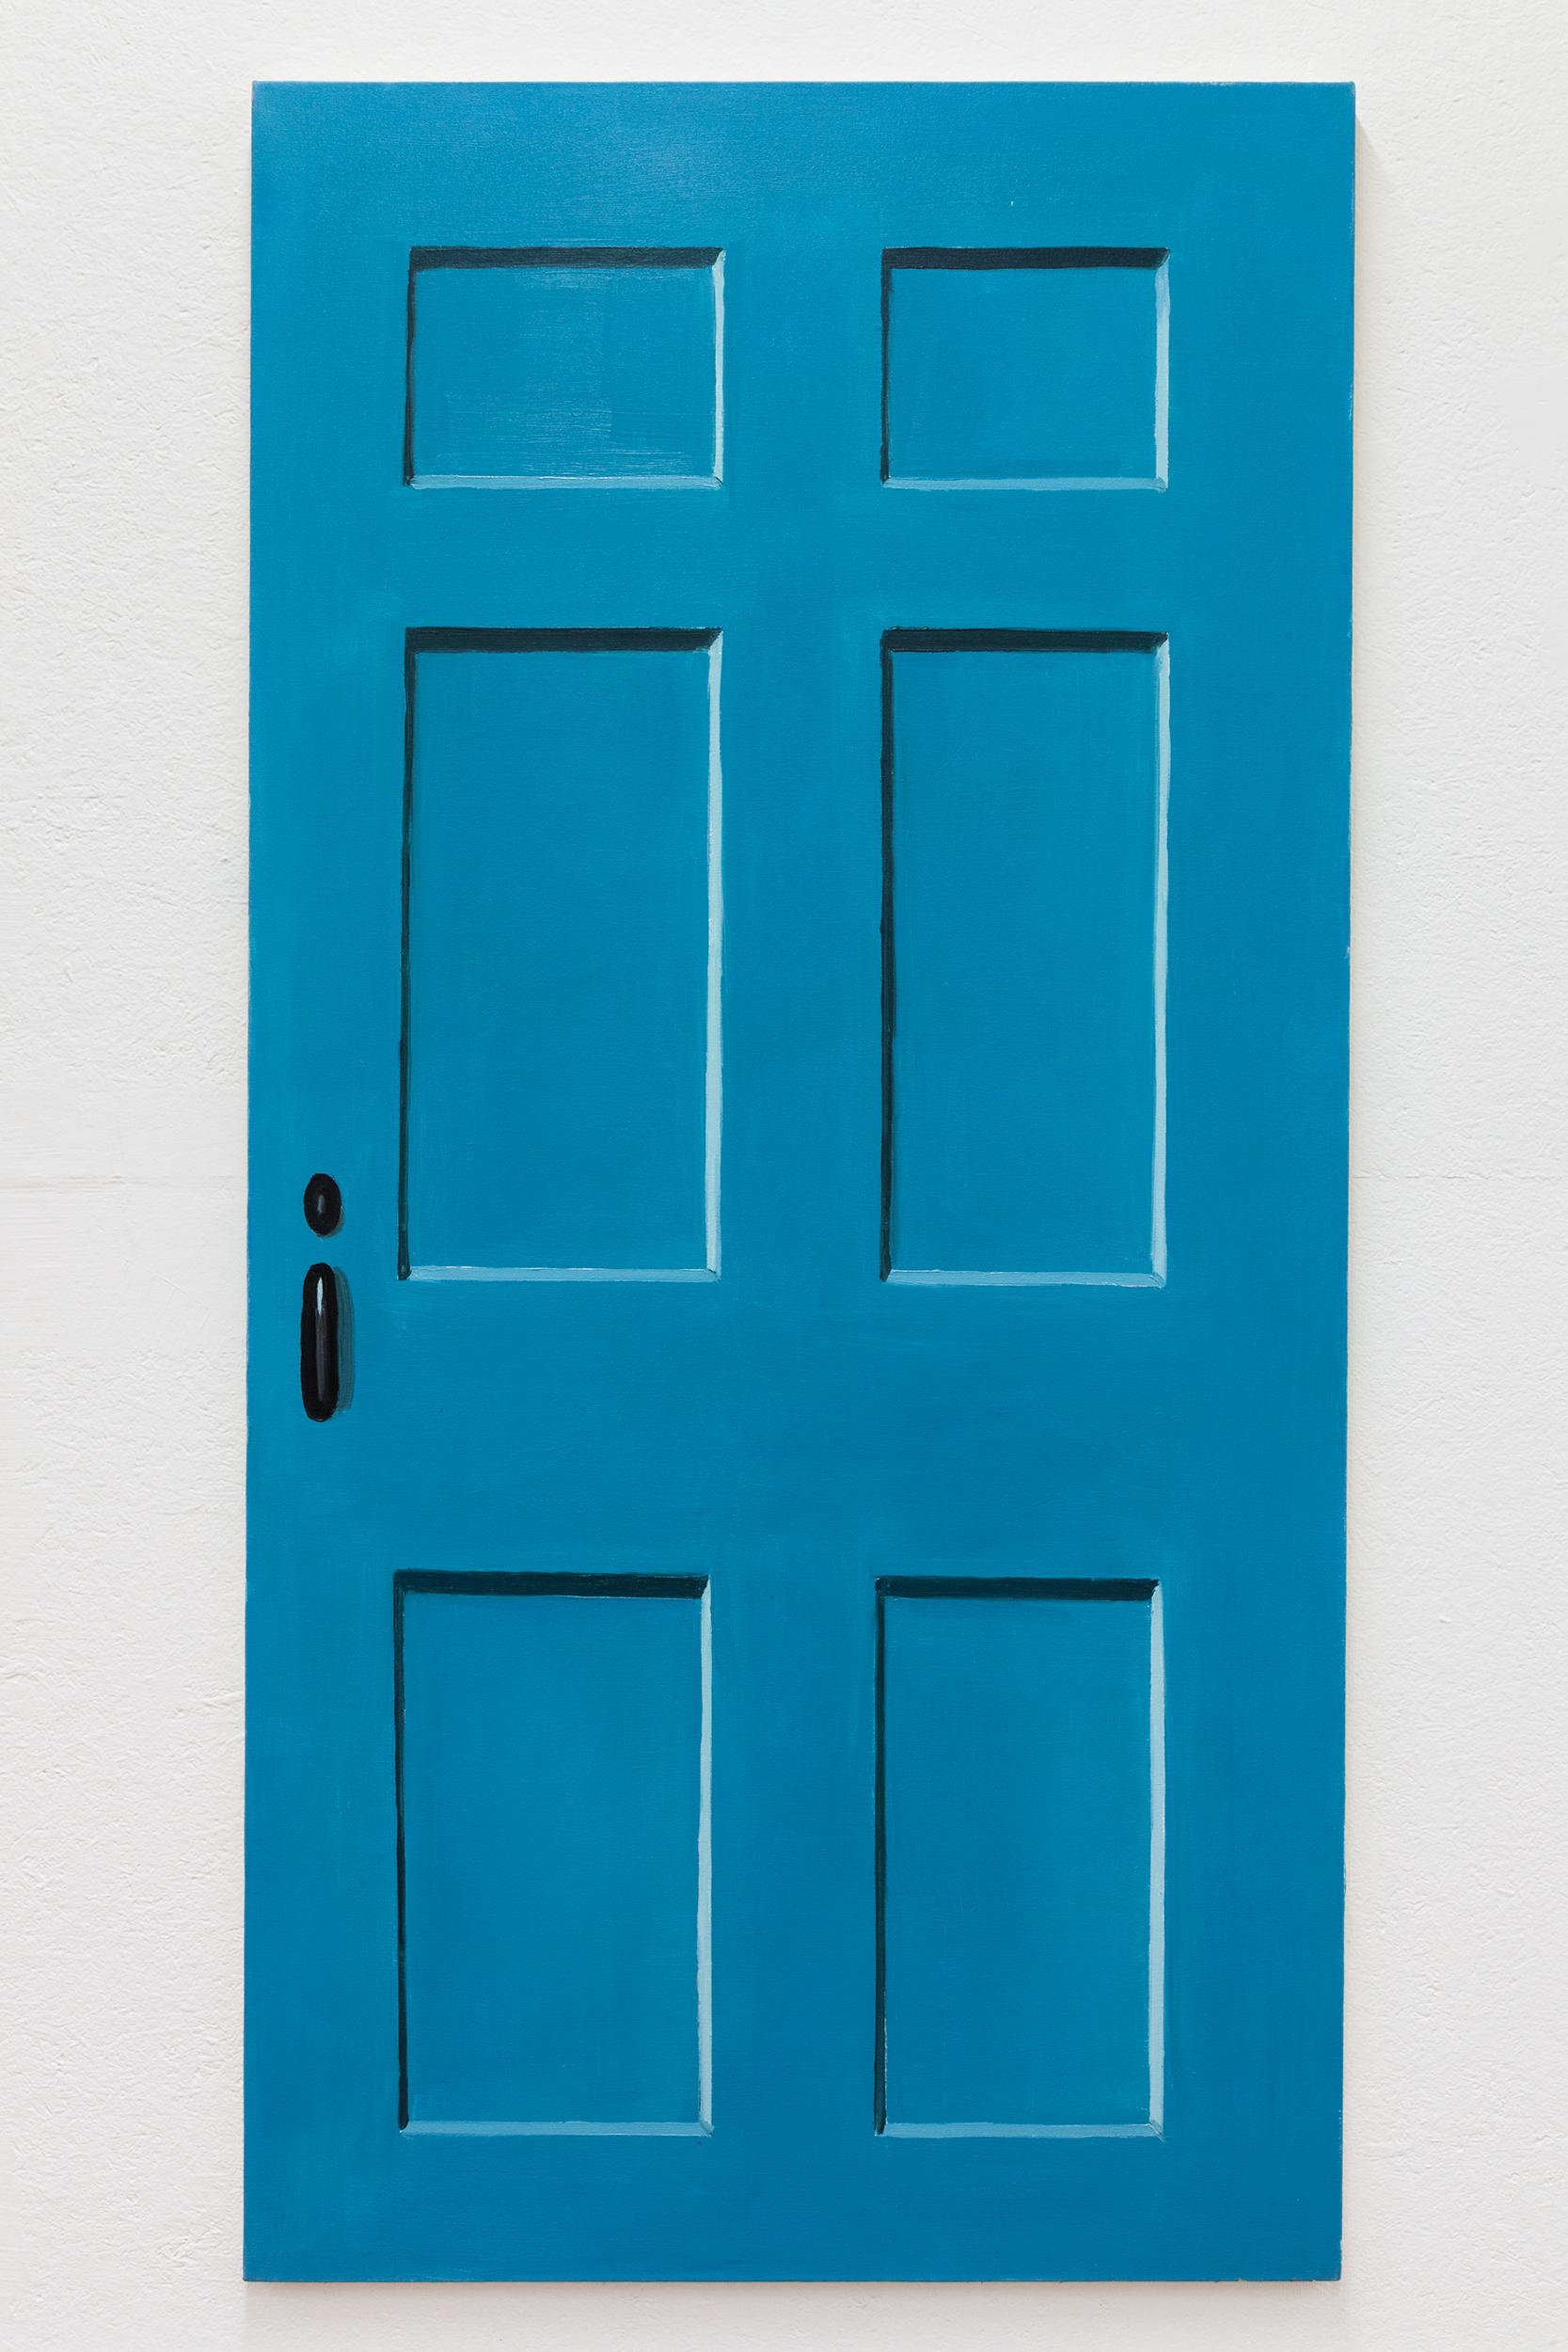 Richard Bosman,  Andy Warhol Door , 2016, Oil on canvas, 72 x 36 inches